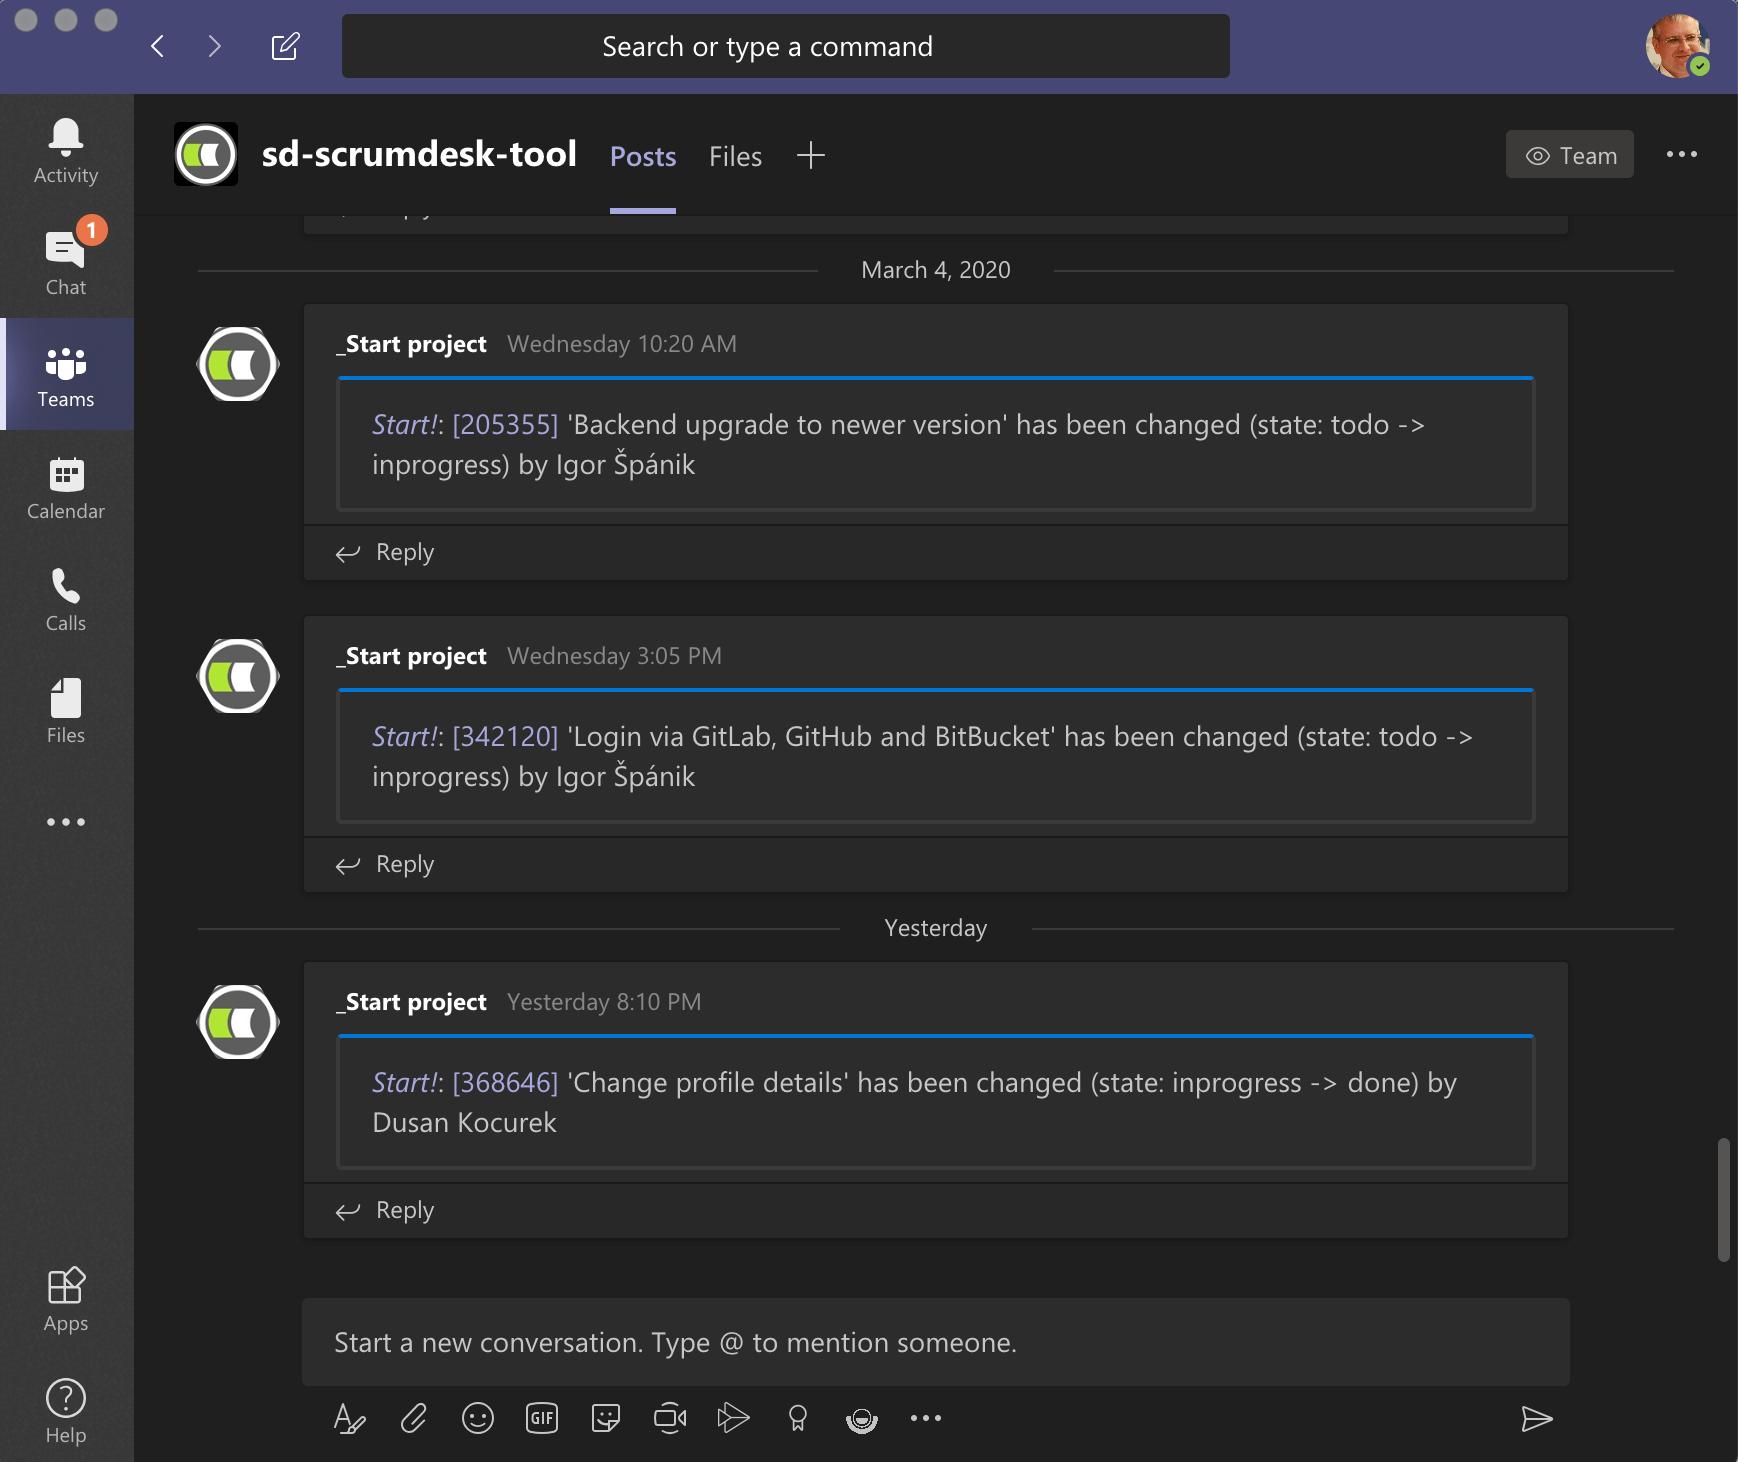 ScrumDesk notification messages in Microsoft Teams